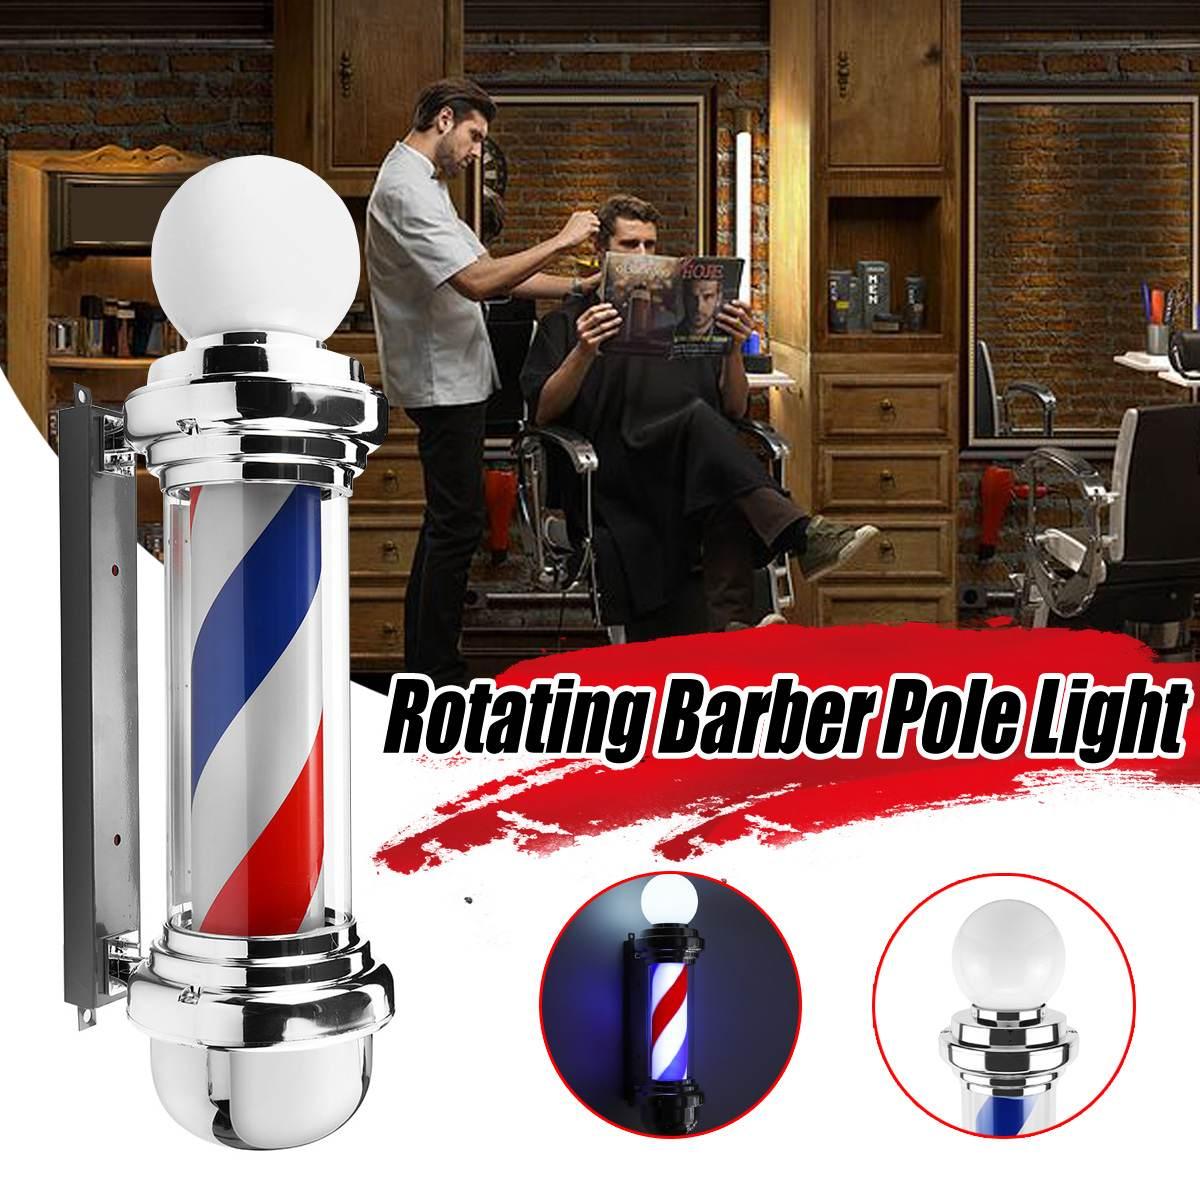 Barber Pole Led Light Hair Salon light Rotating light lamp with Bulb Marker lamp LED Downlights 68x19x24cm 220V EU/110V US Plug